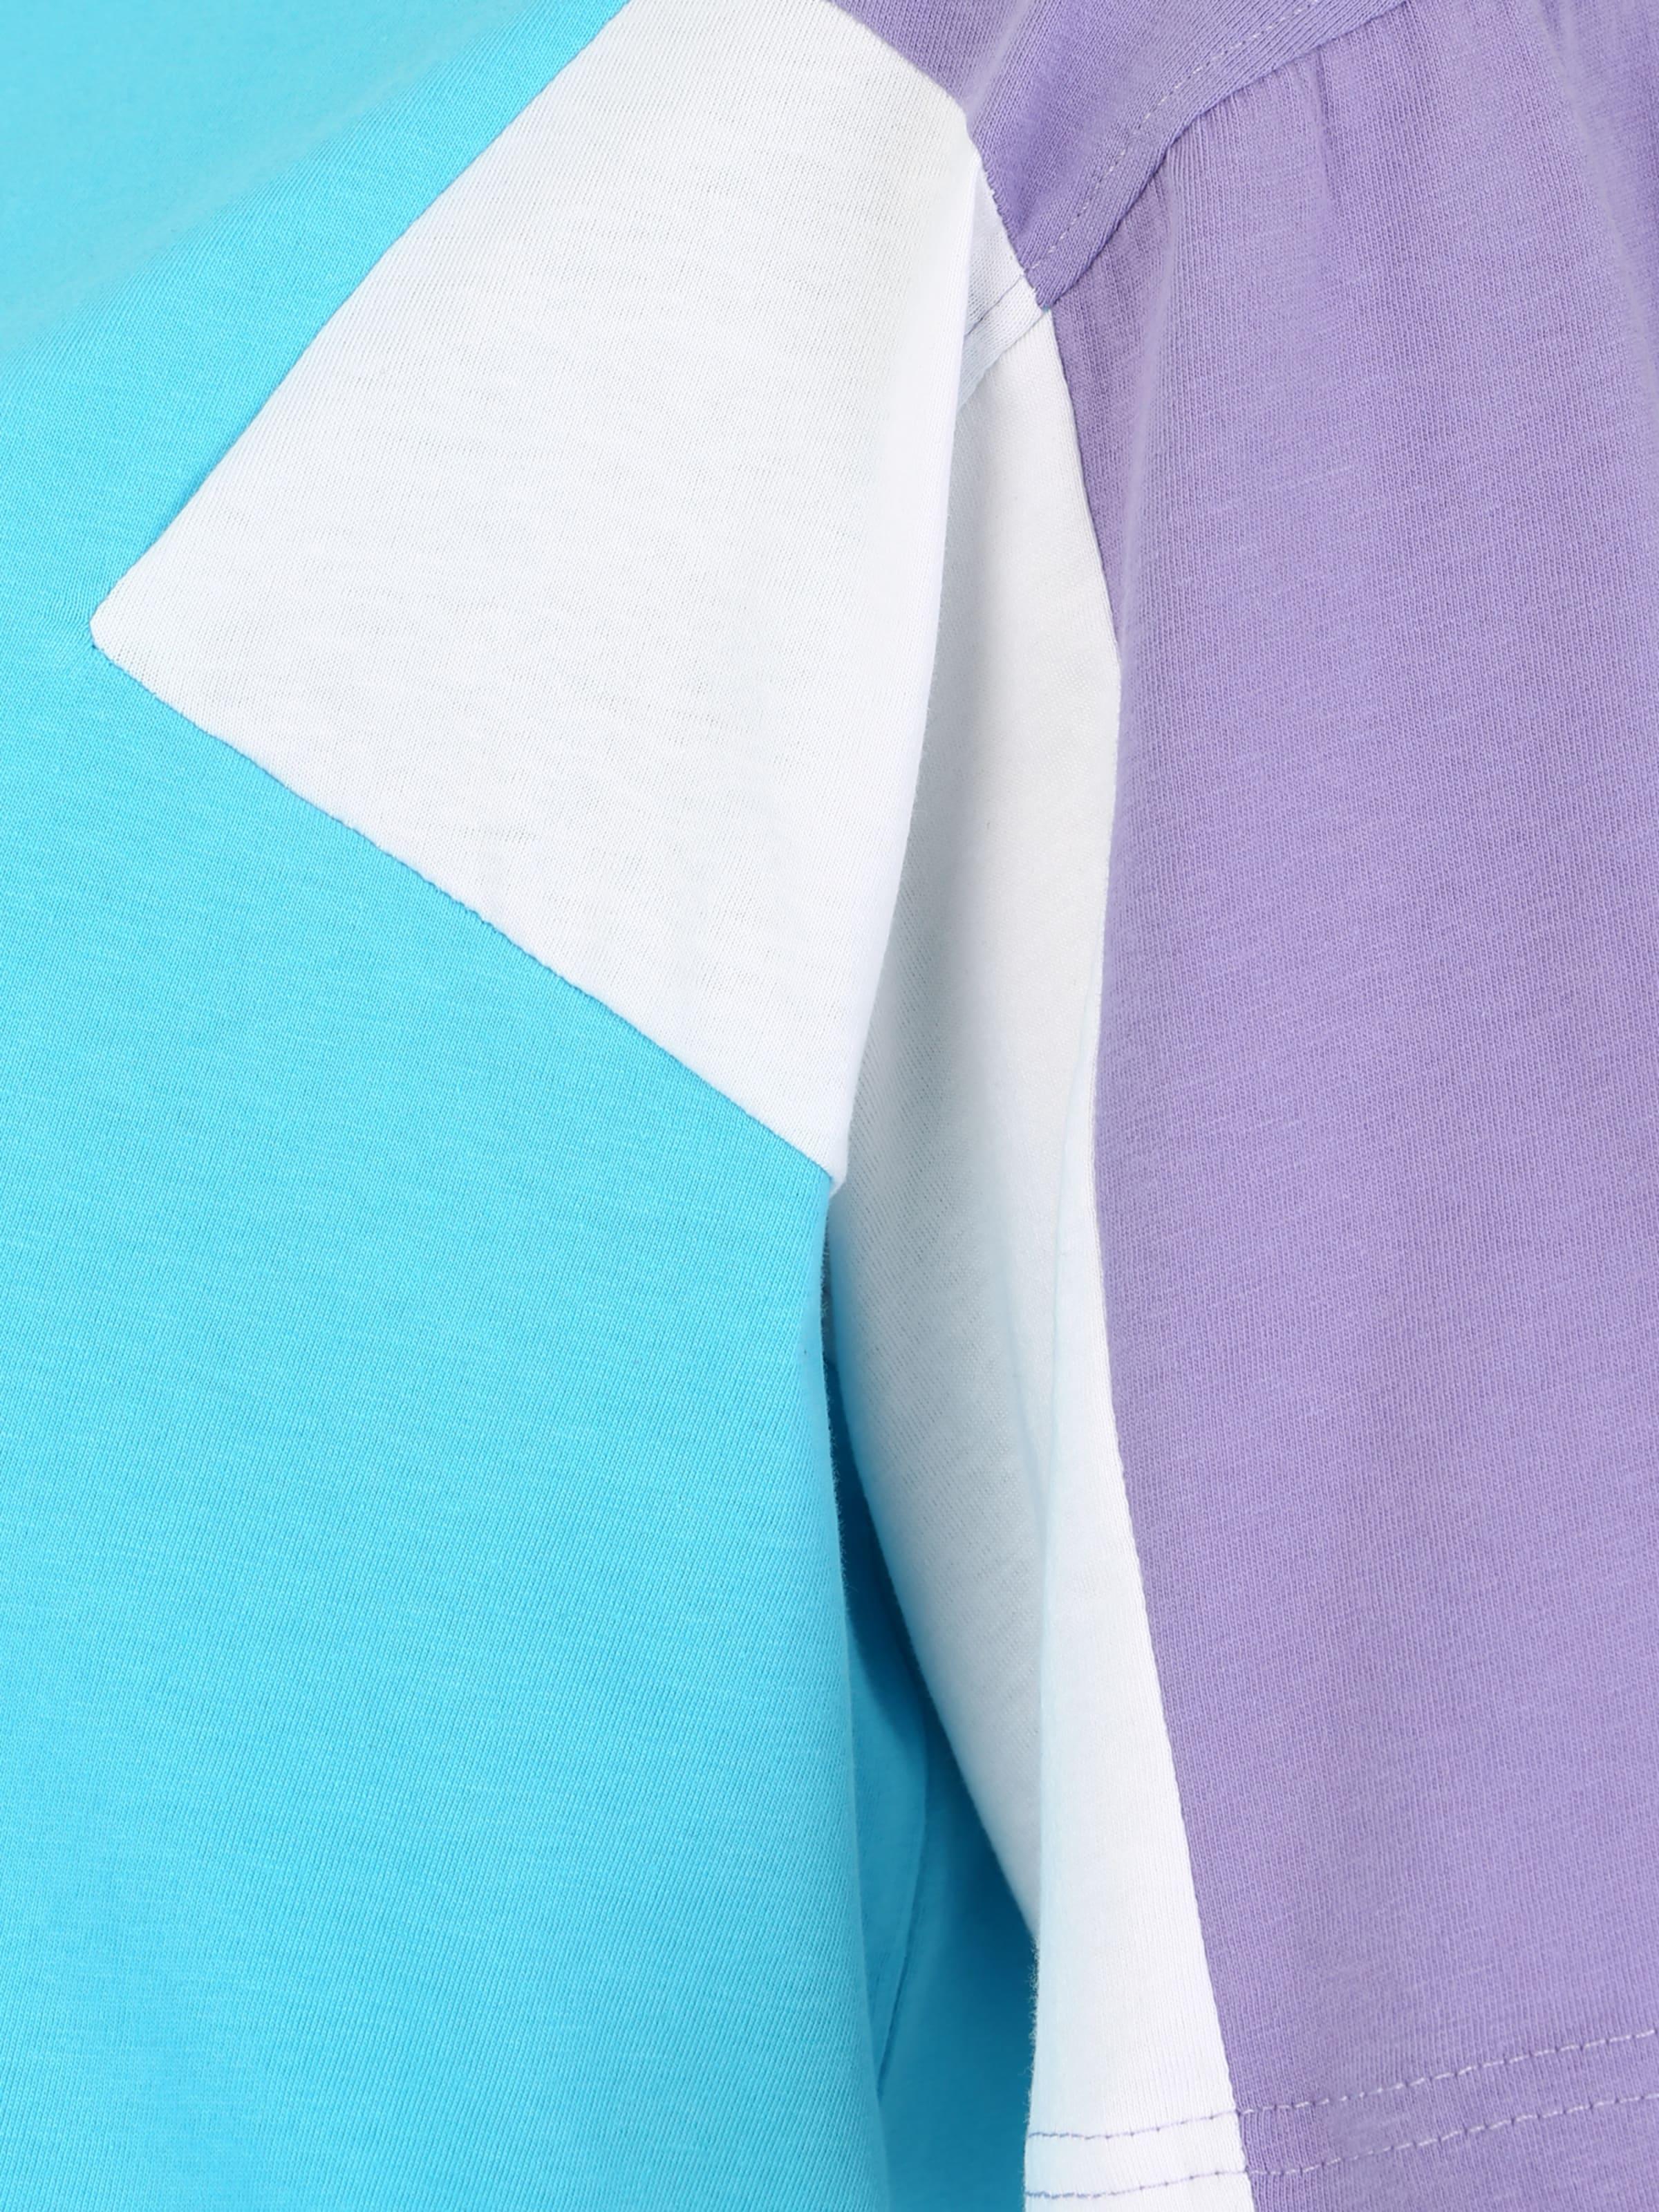 Urban GrisNoir Blanc Curvy Classics T shirt En vNnm08wO